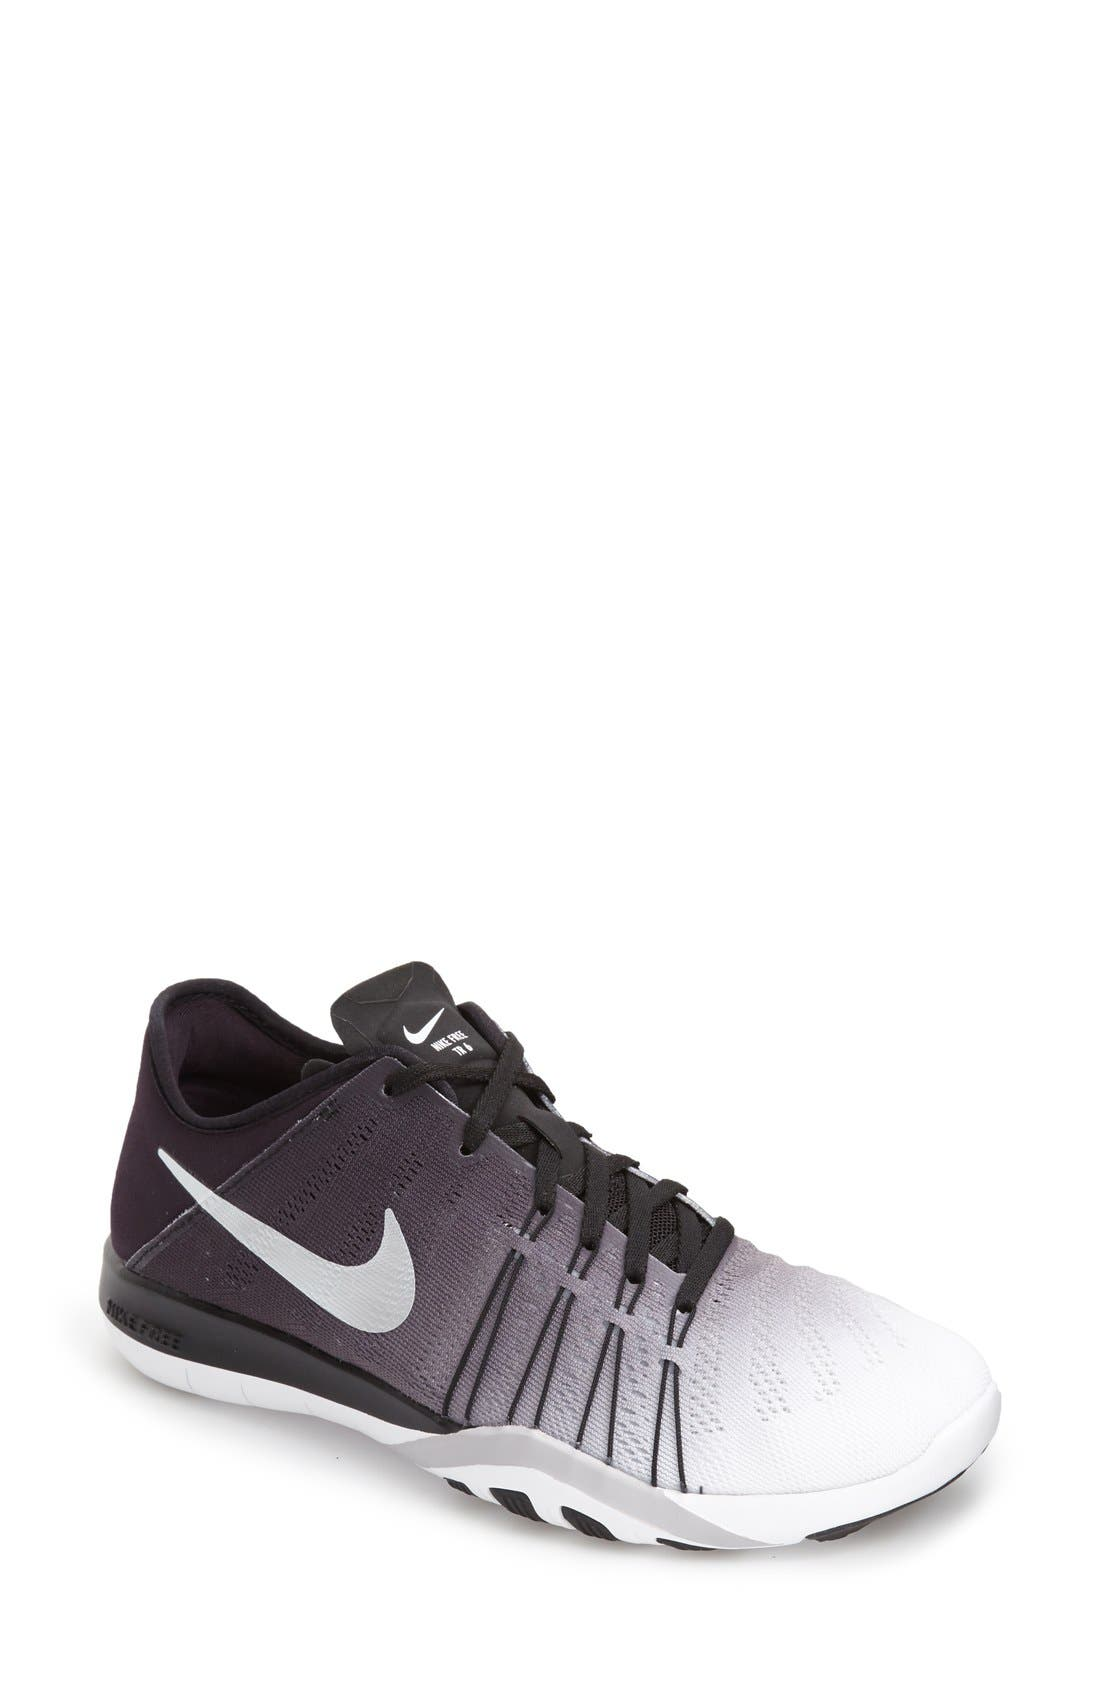 Alternate Image 1 Selected - Nike Free TR 6 Spectrum Training Shoe (Women)